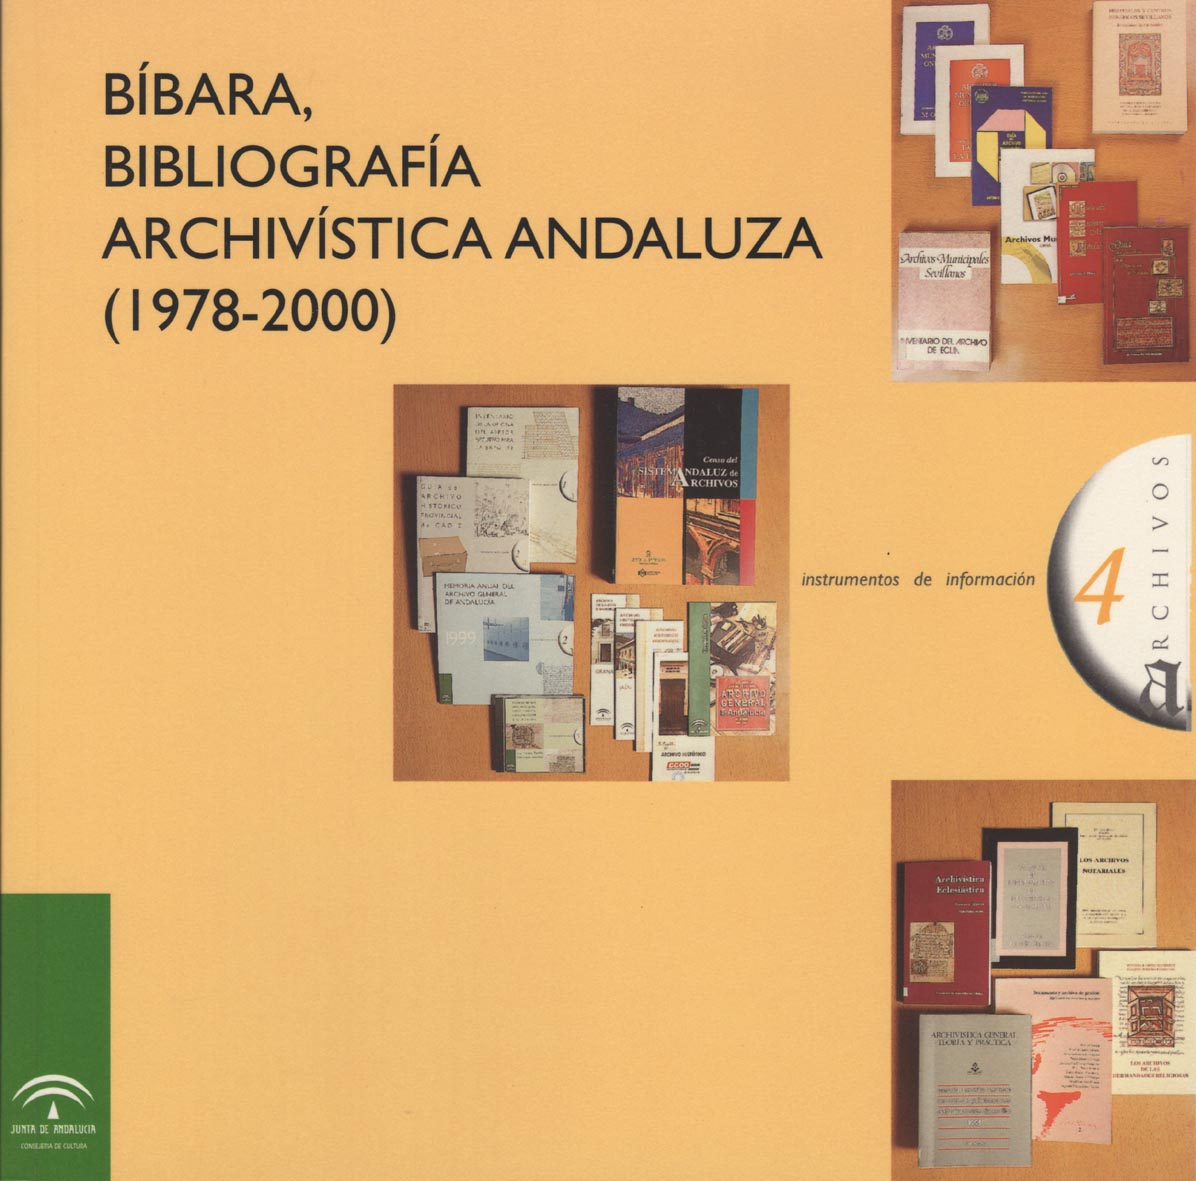 BÍBARA, Bibliografía Archivística Andaluza (1978-2000)